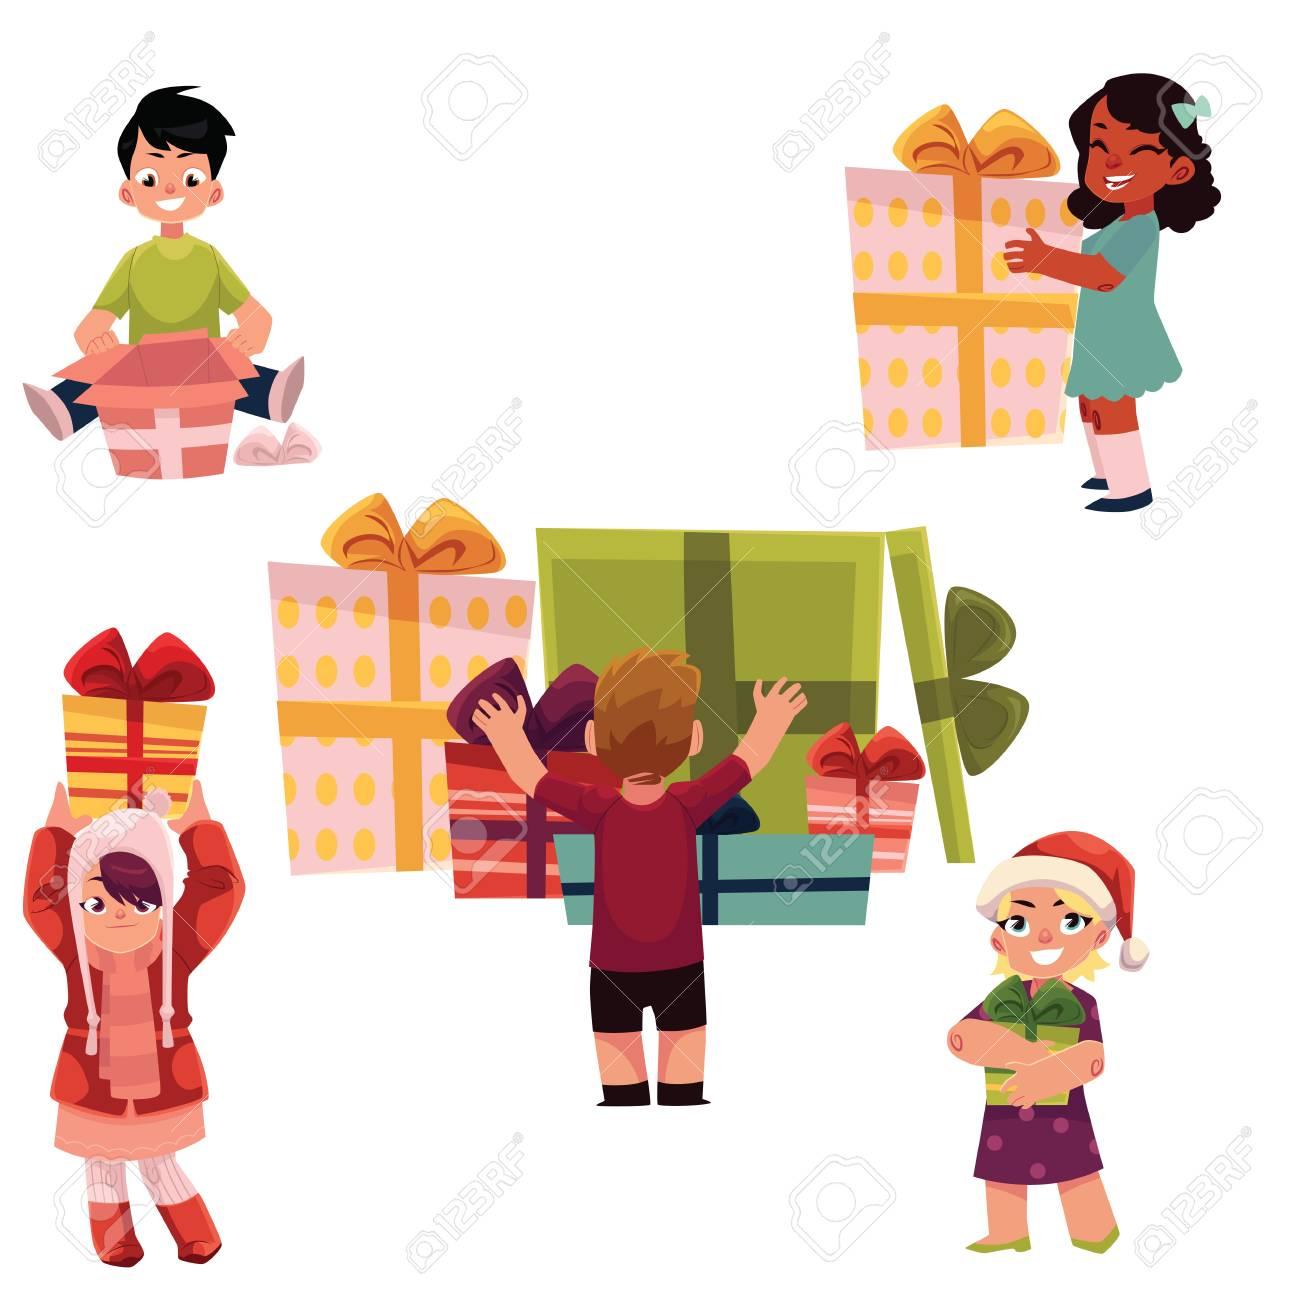 Set Of Kids Children Holding Opening Getting Christmas New Year Birthday